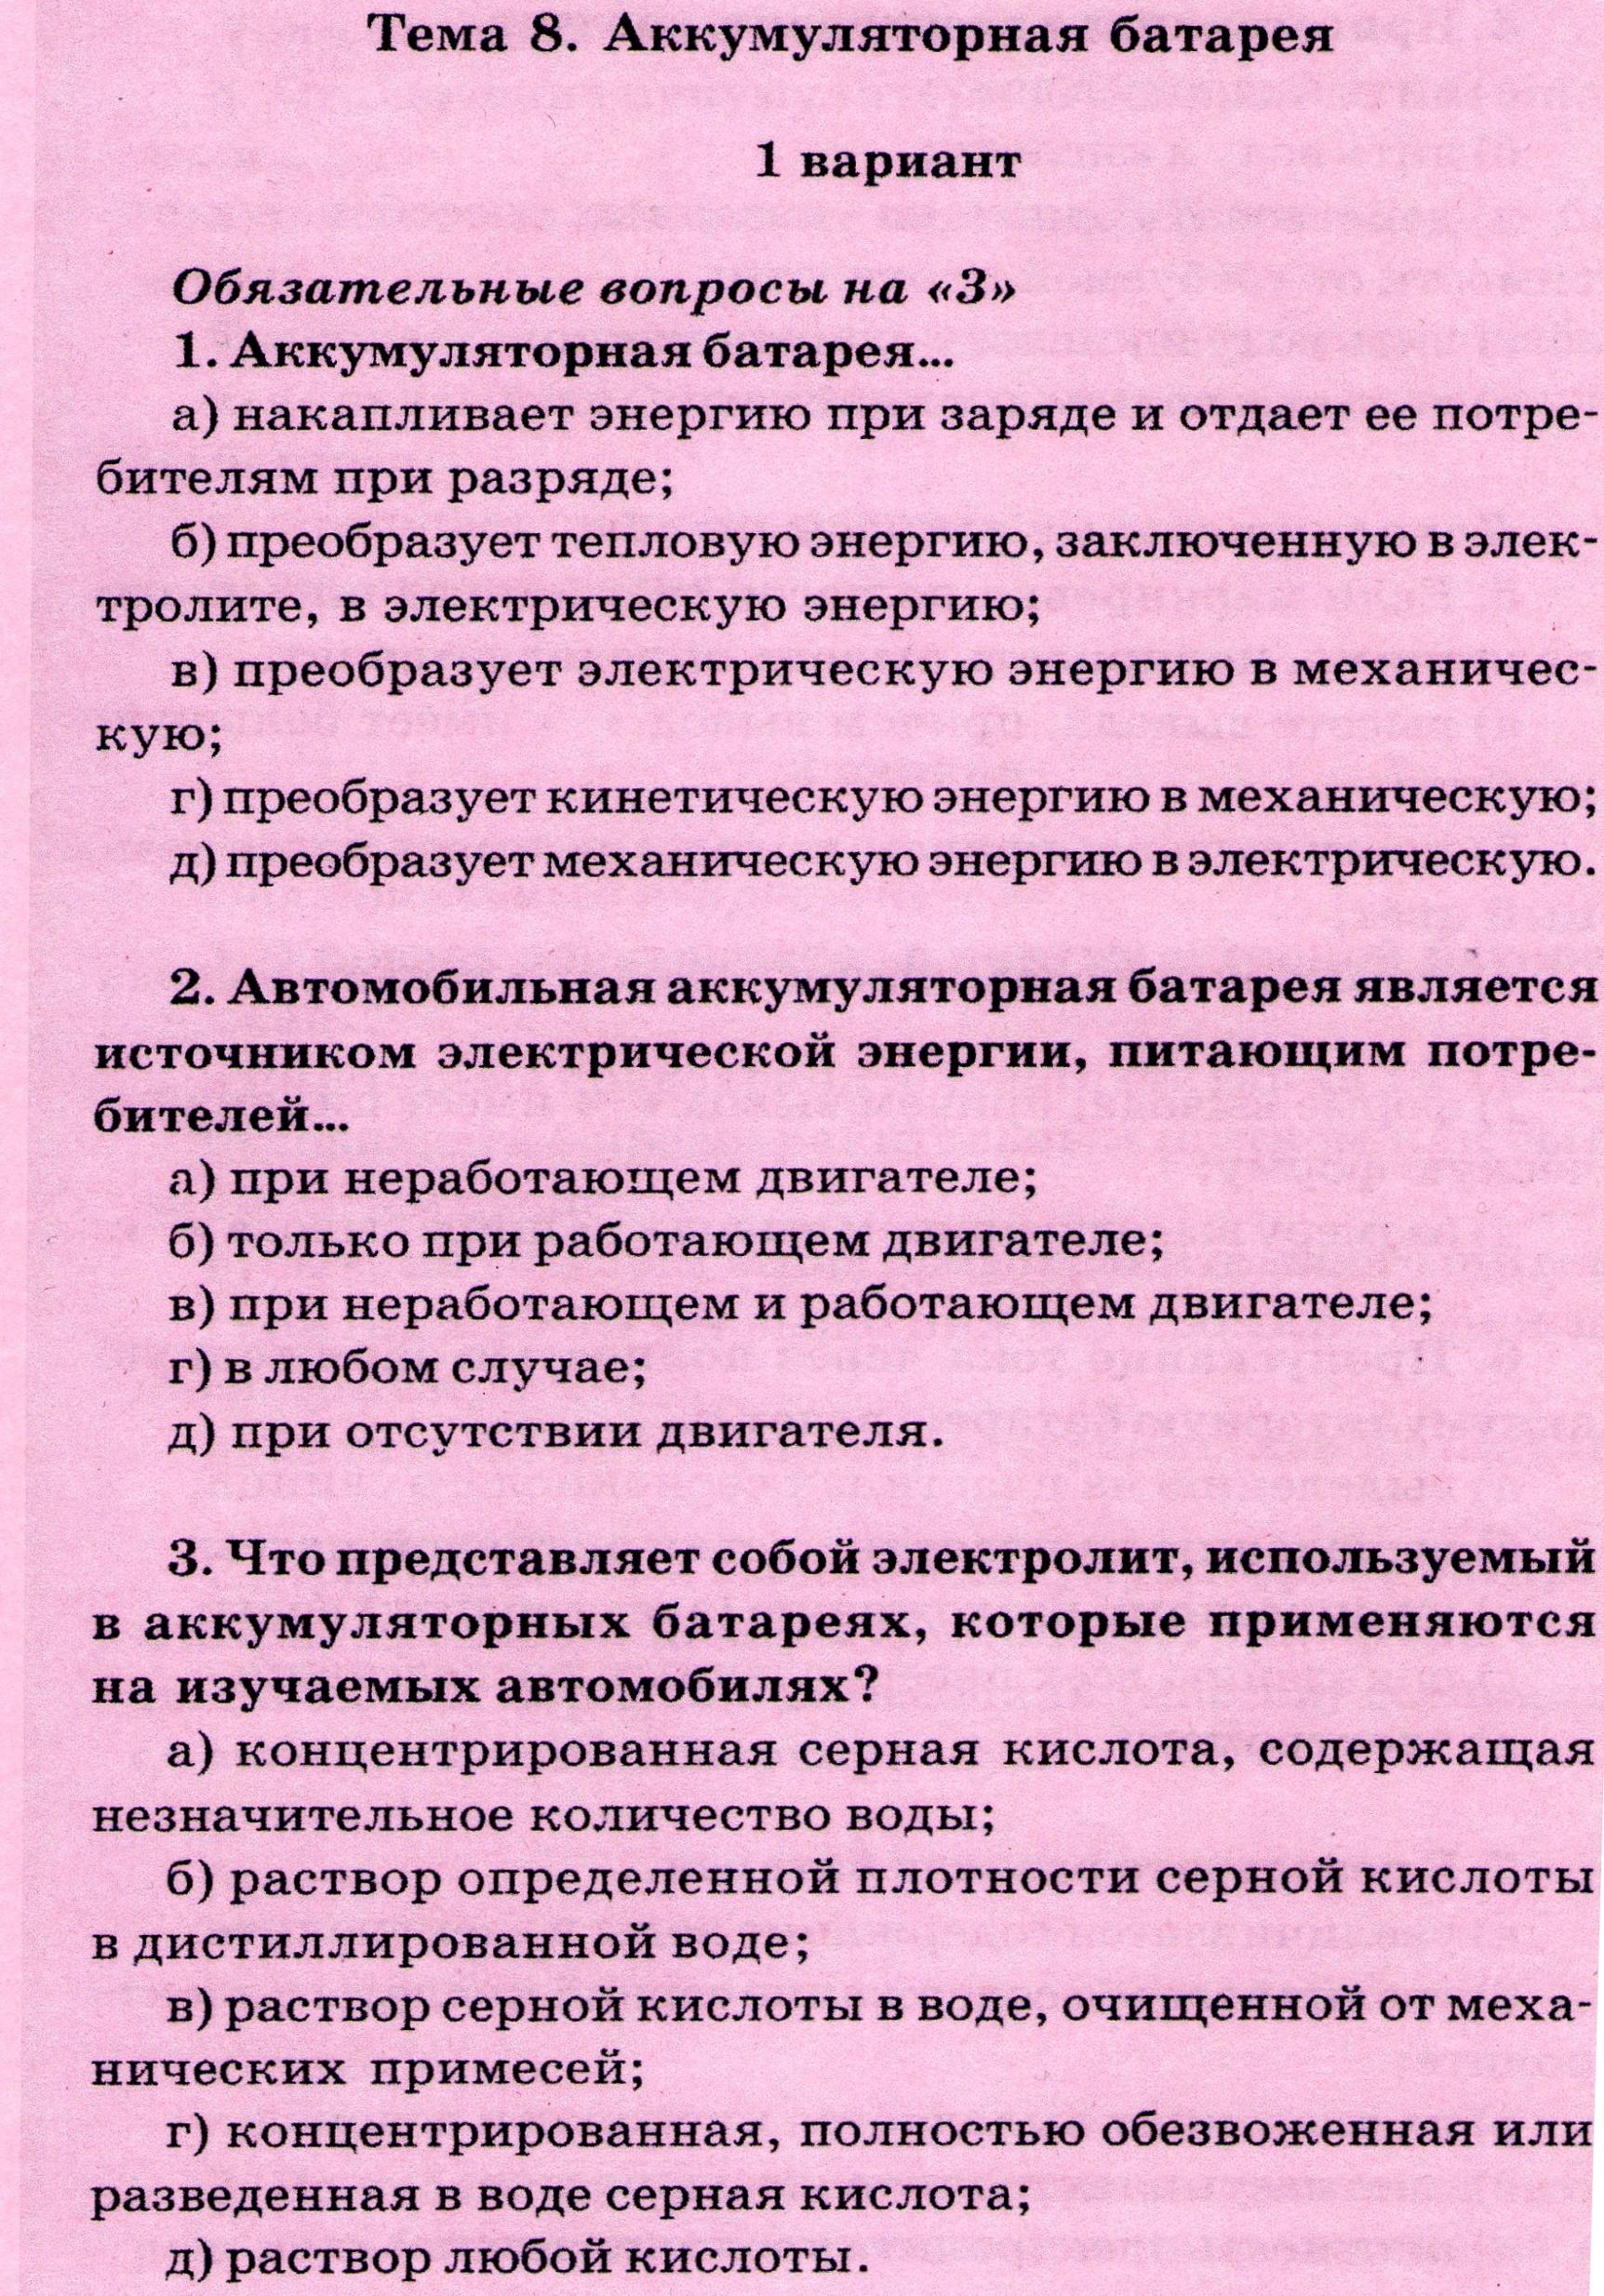 C:\Users\Василий Мельченко\Pictures\img543.jpg